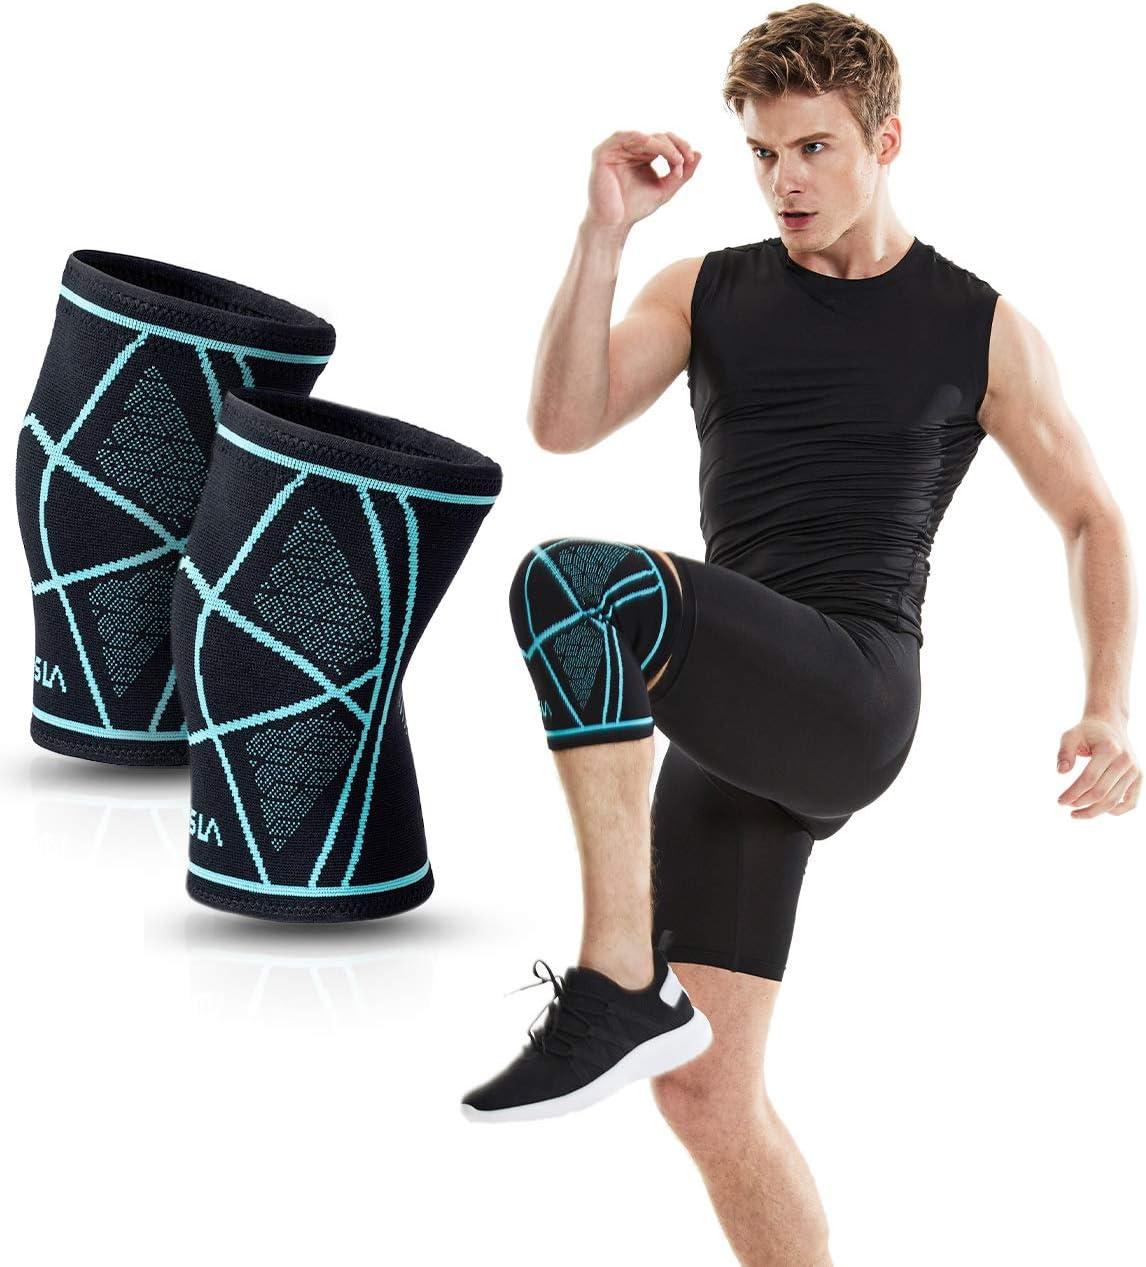 TSLA 1 or Elegant 2 pcs Brand new Knee Sleeve Brace Compression Support for